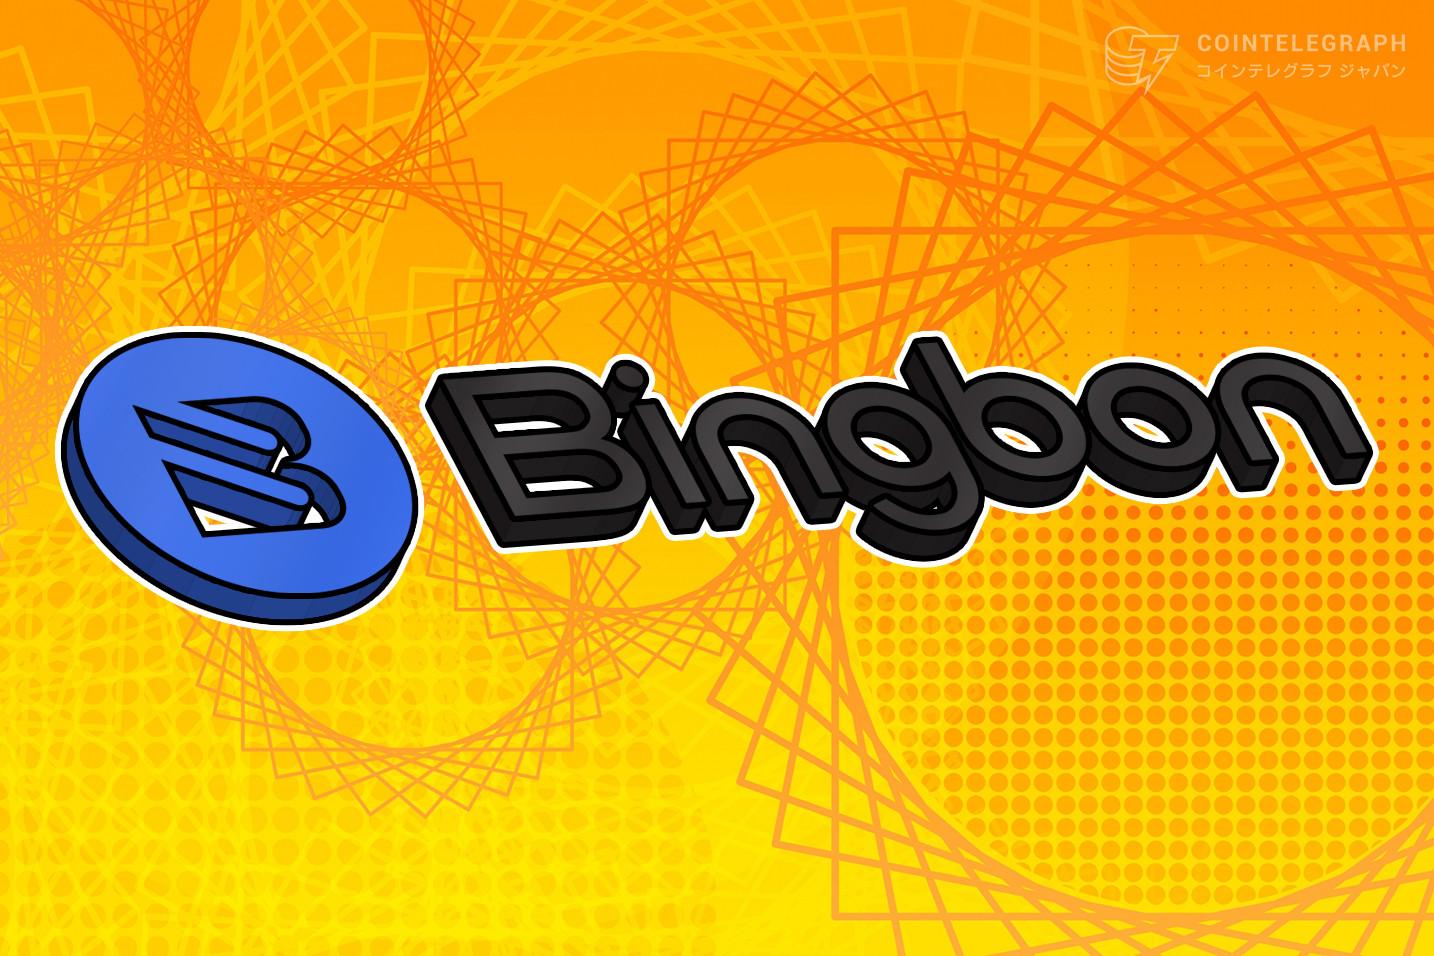 Bingbonグローバルデリバティブ取引所 ー 契約取引ペア新規追加、コピー注文、コミュニティイベント大人気